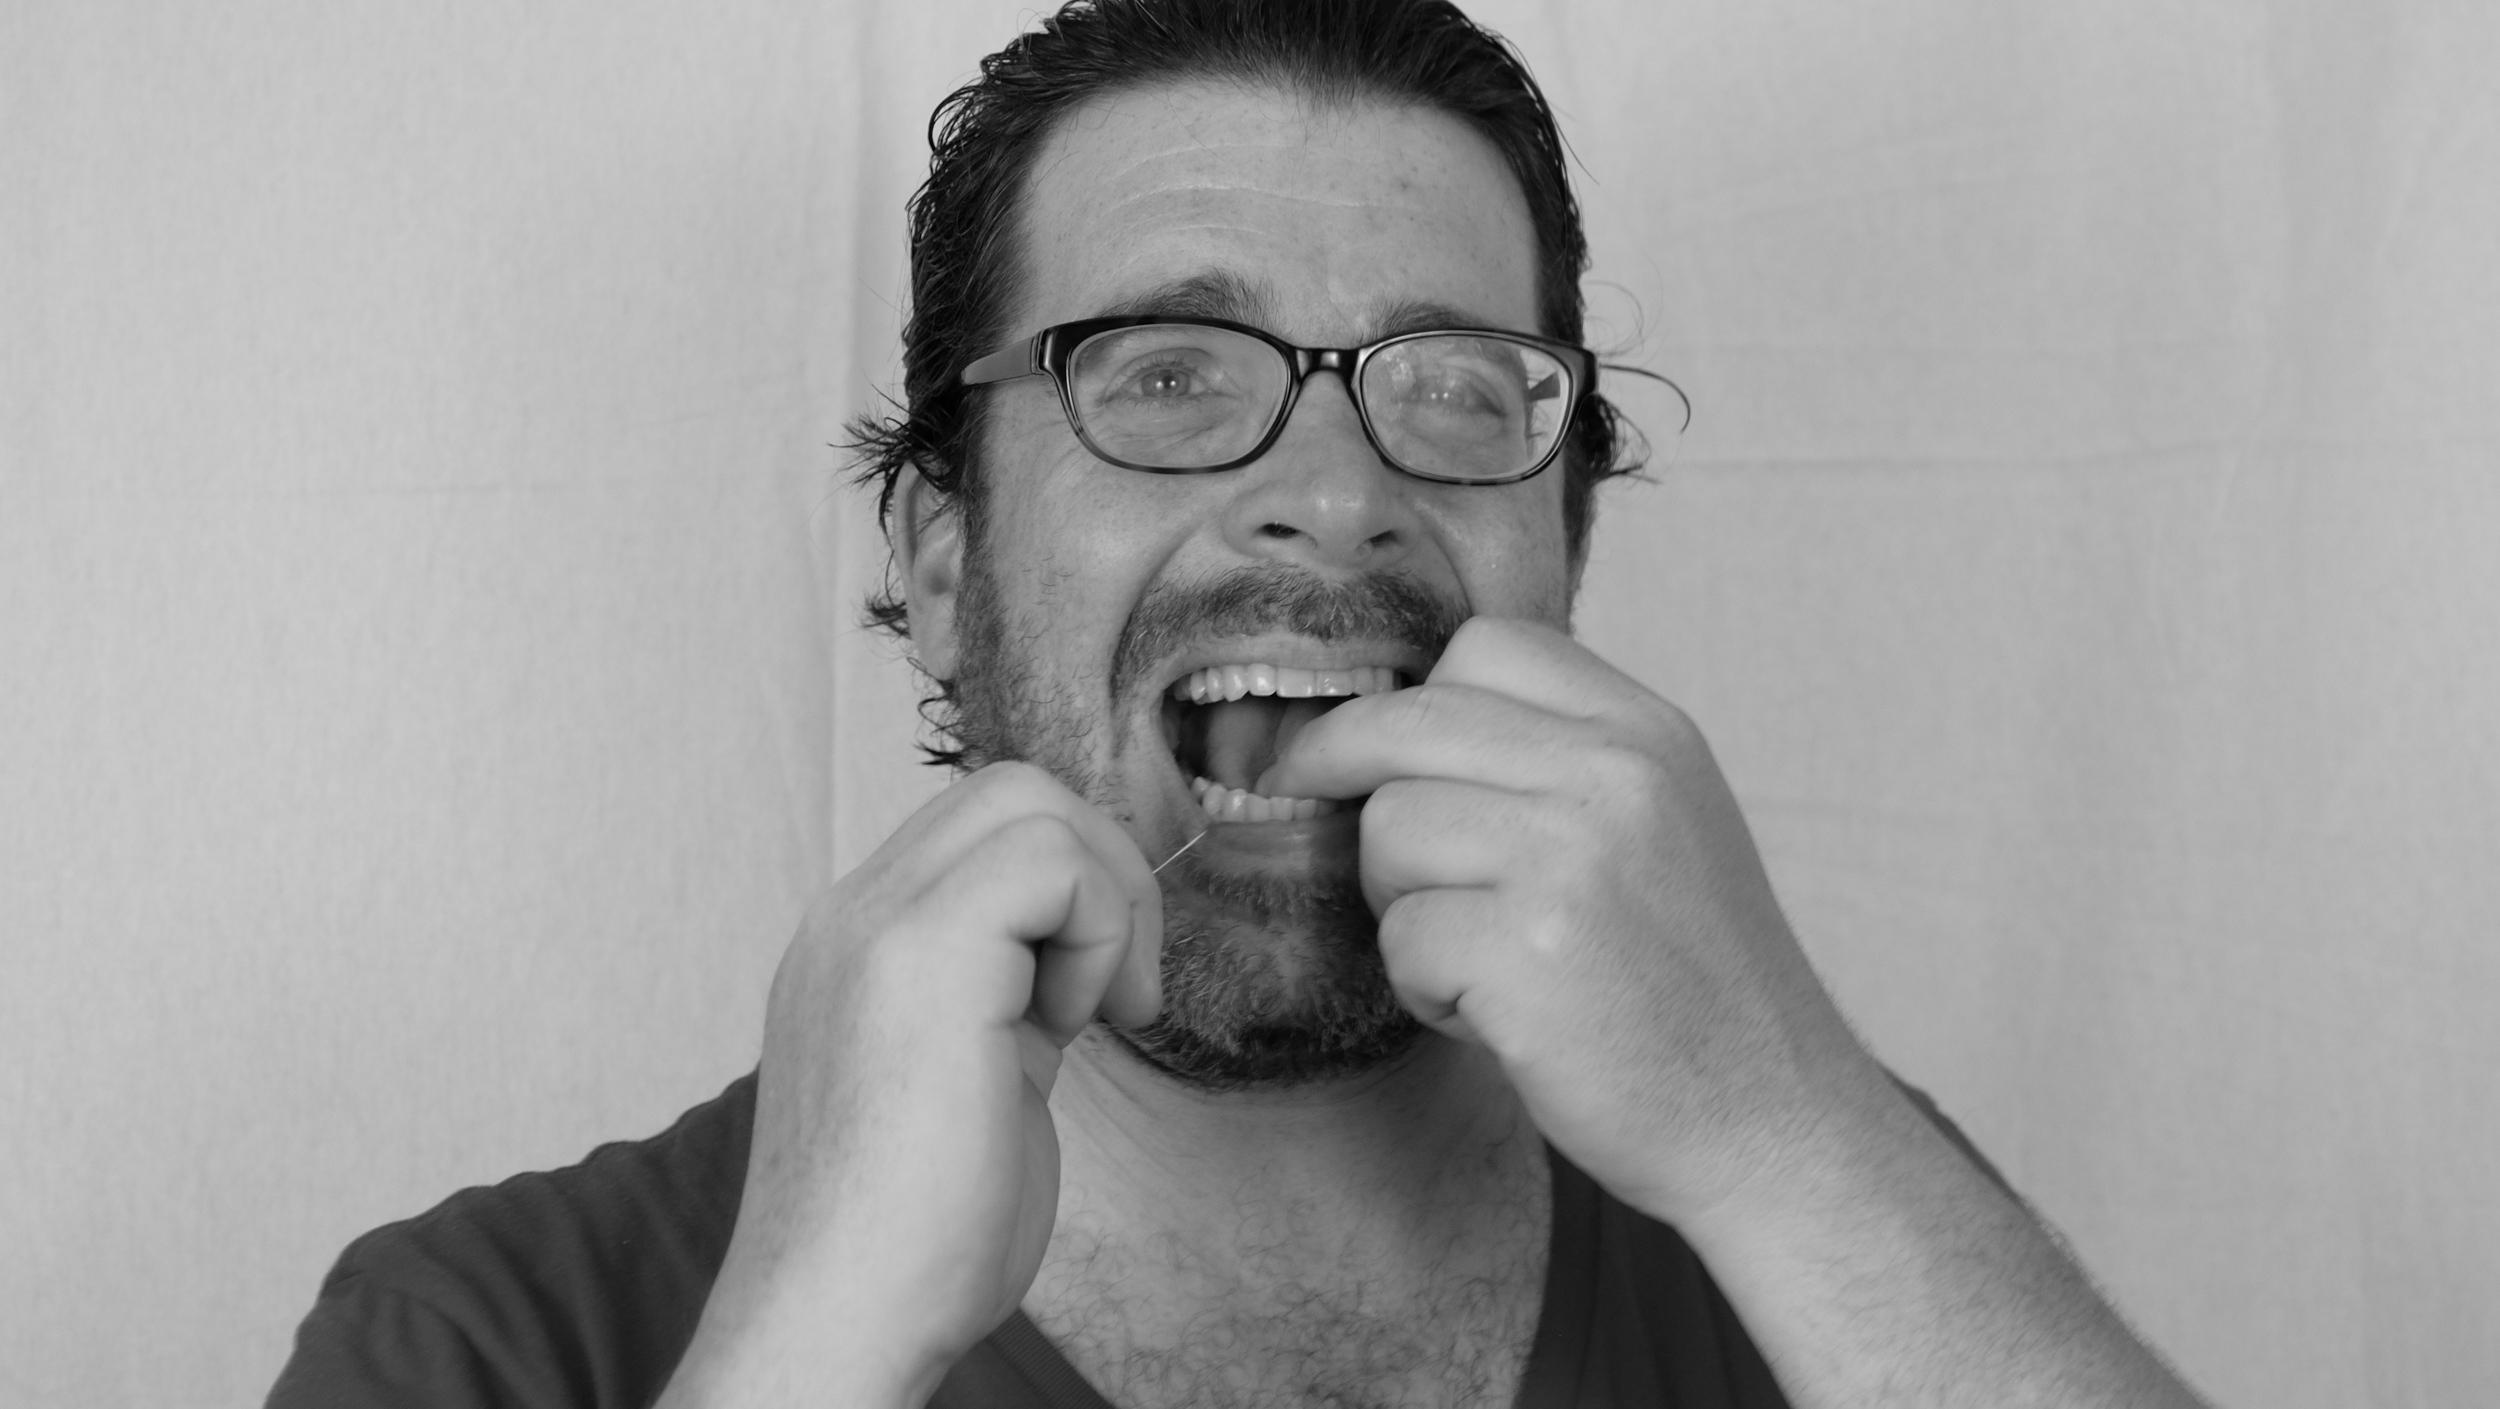 Portrait: Everyday Habits with Jeremy Bendik-Keymer